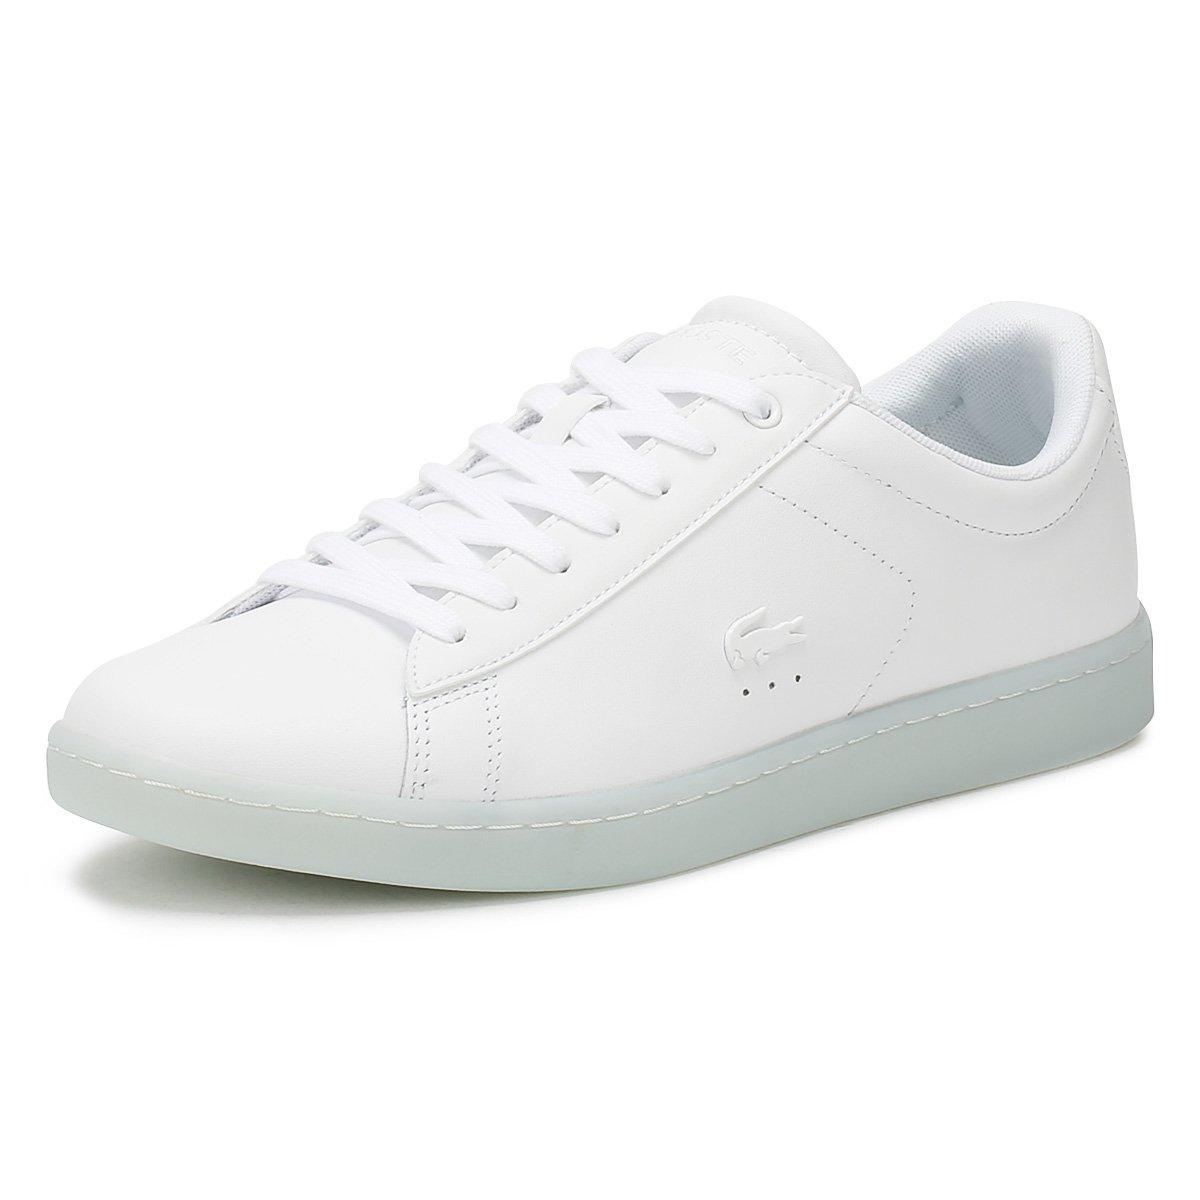 Lacoste Mujer Blanco / Light Azul Carnaby EVO 118 3 Zapatillas 35.5 EU|Blanco